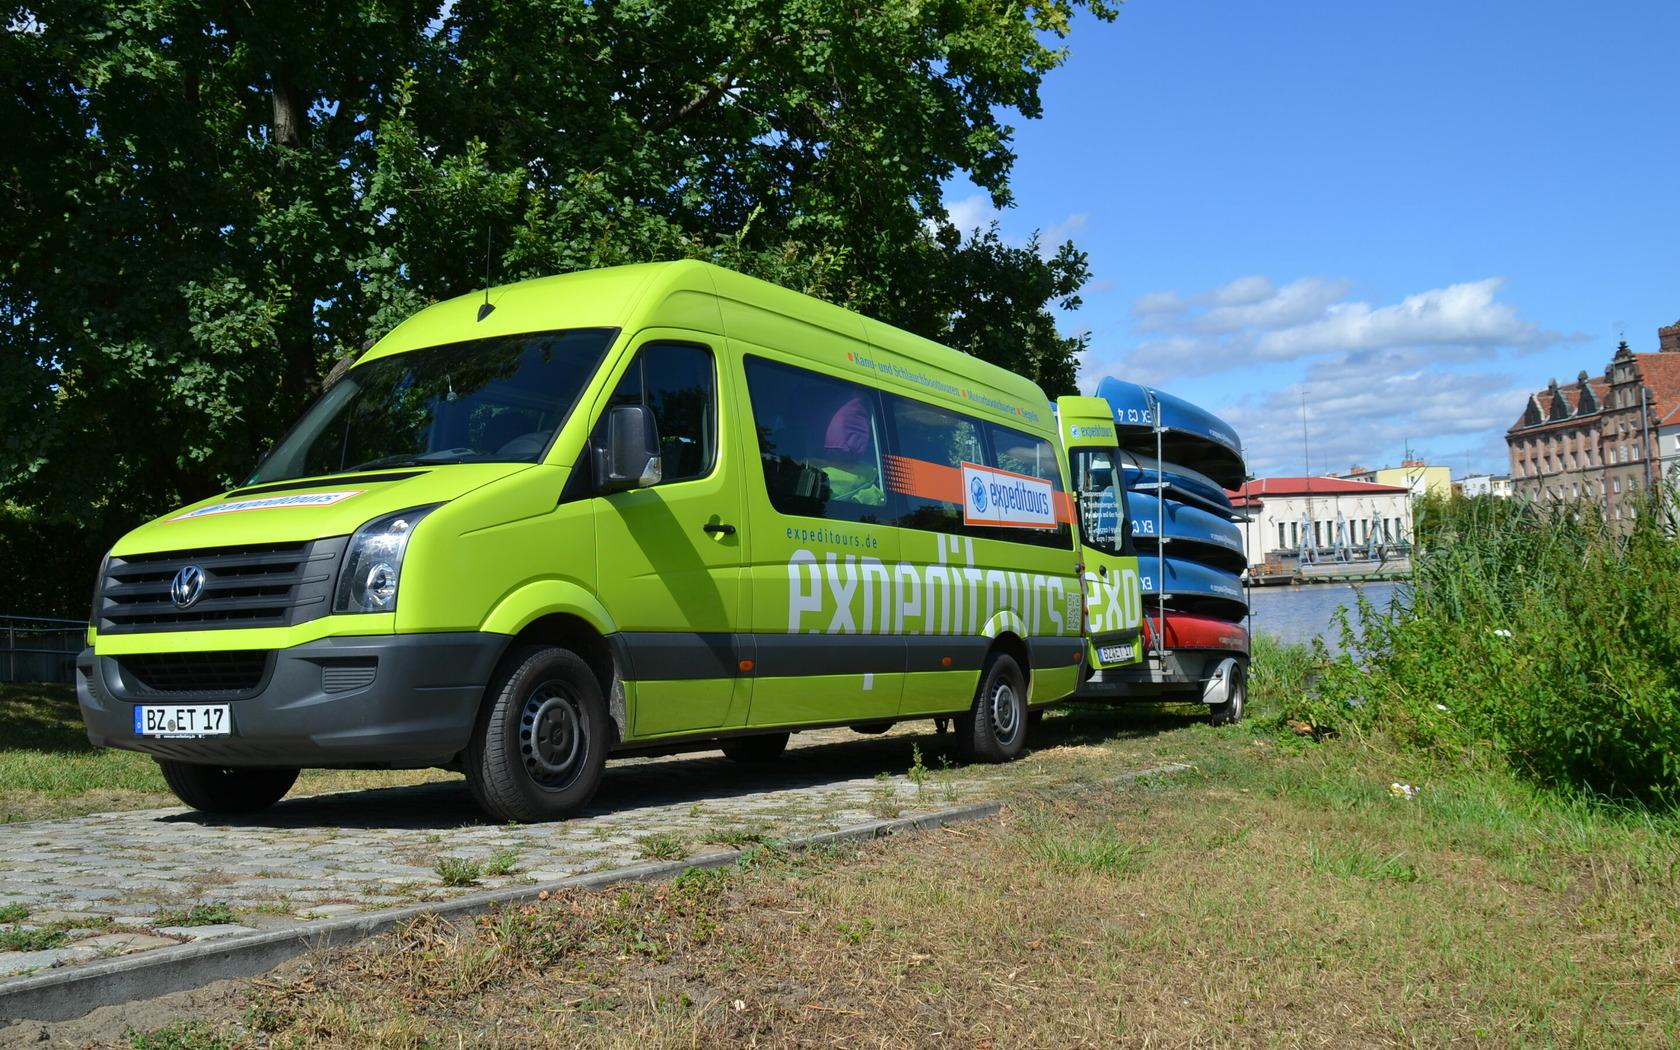 Expeditours, Foto: MuT ― Marketing und Tourismus Guben e.V., Lizenz: MuT ― Marketing und Tourismus Guben e.V.